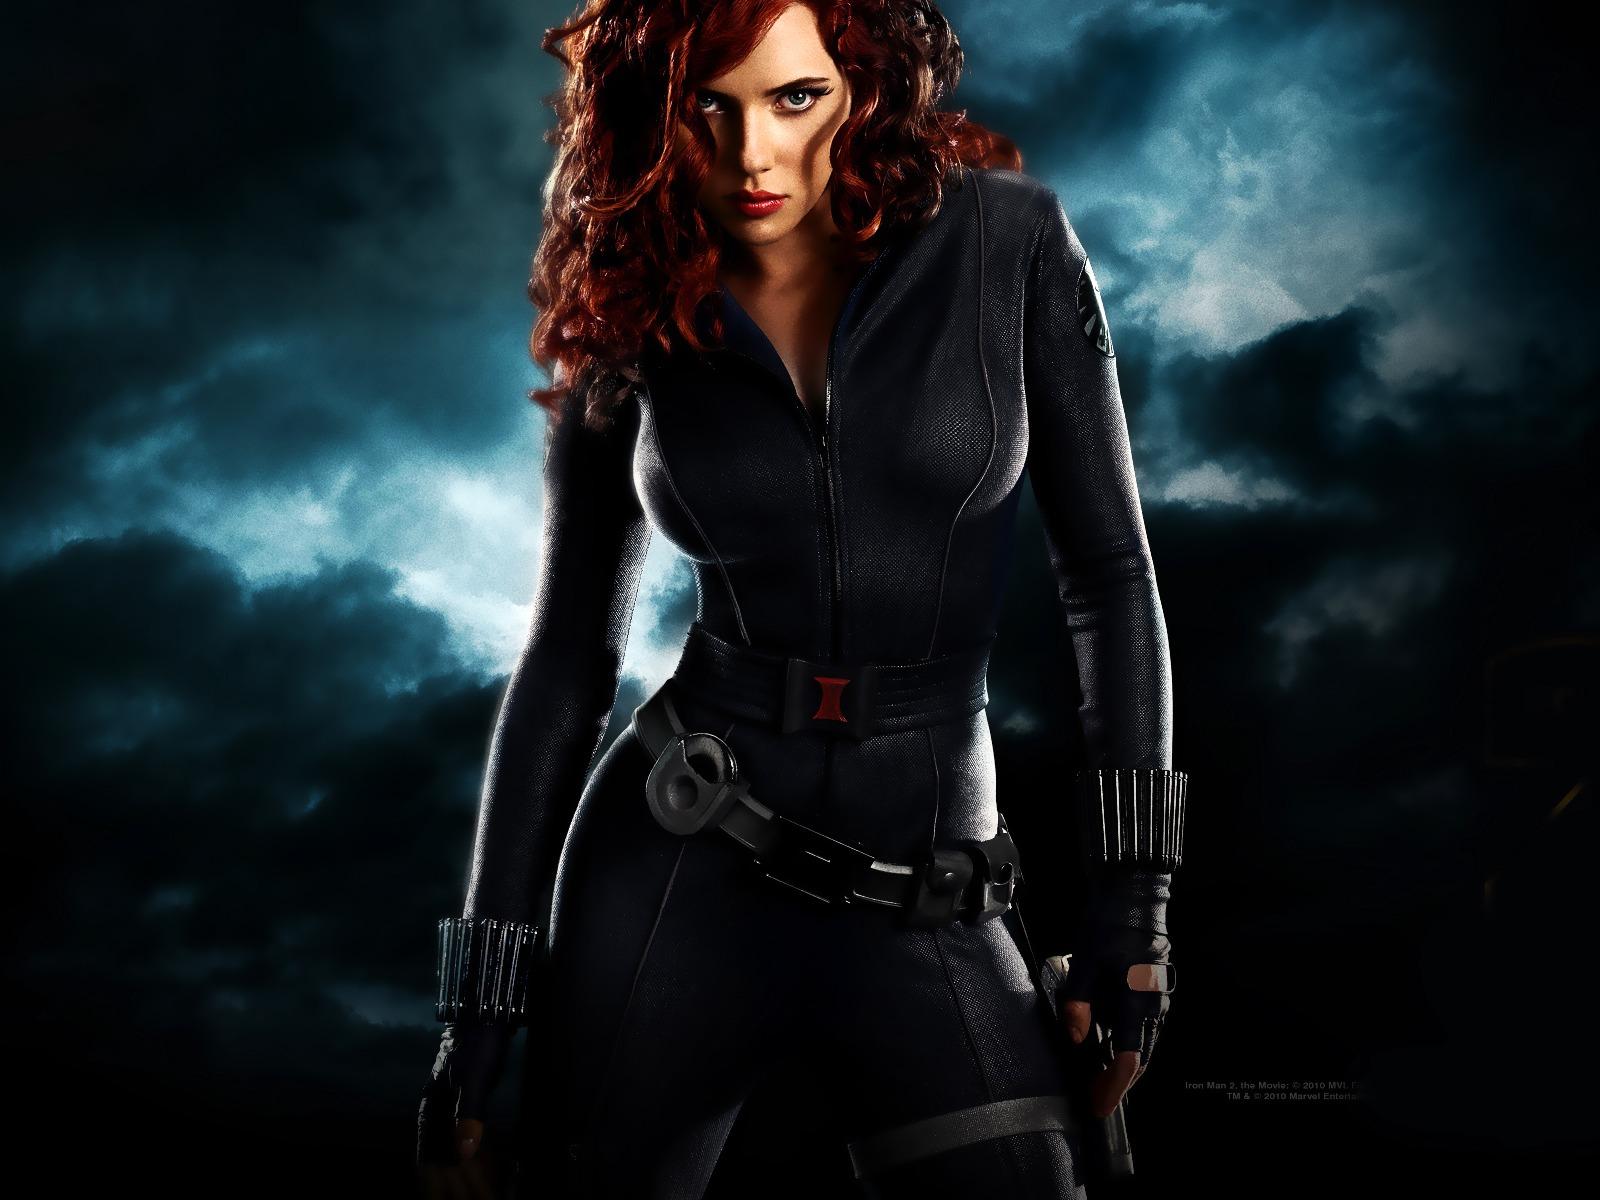 http://1.bp.blogspot.com/_EaV221bYaso/S8u8gohRm1I/AAAAAAAADfo/KLLG1Dz4Jlg/s1600/Scarlett+Johansson+as+Black+Widow++%283%29.jpg